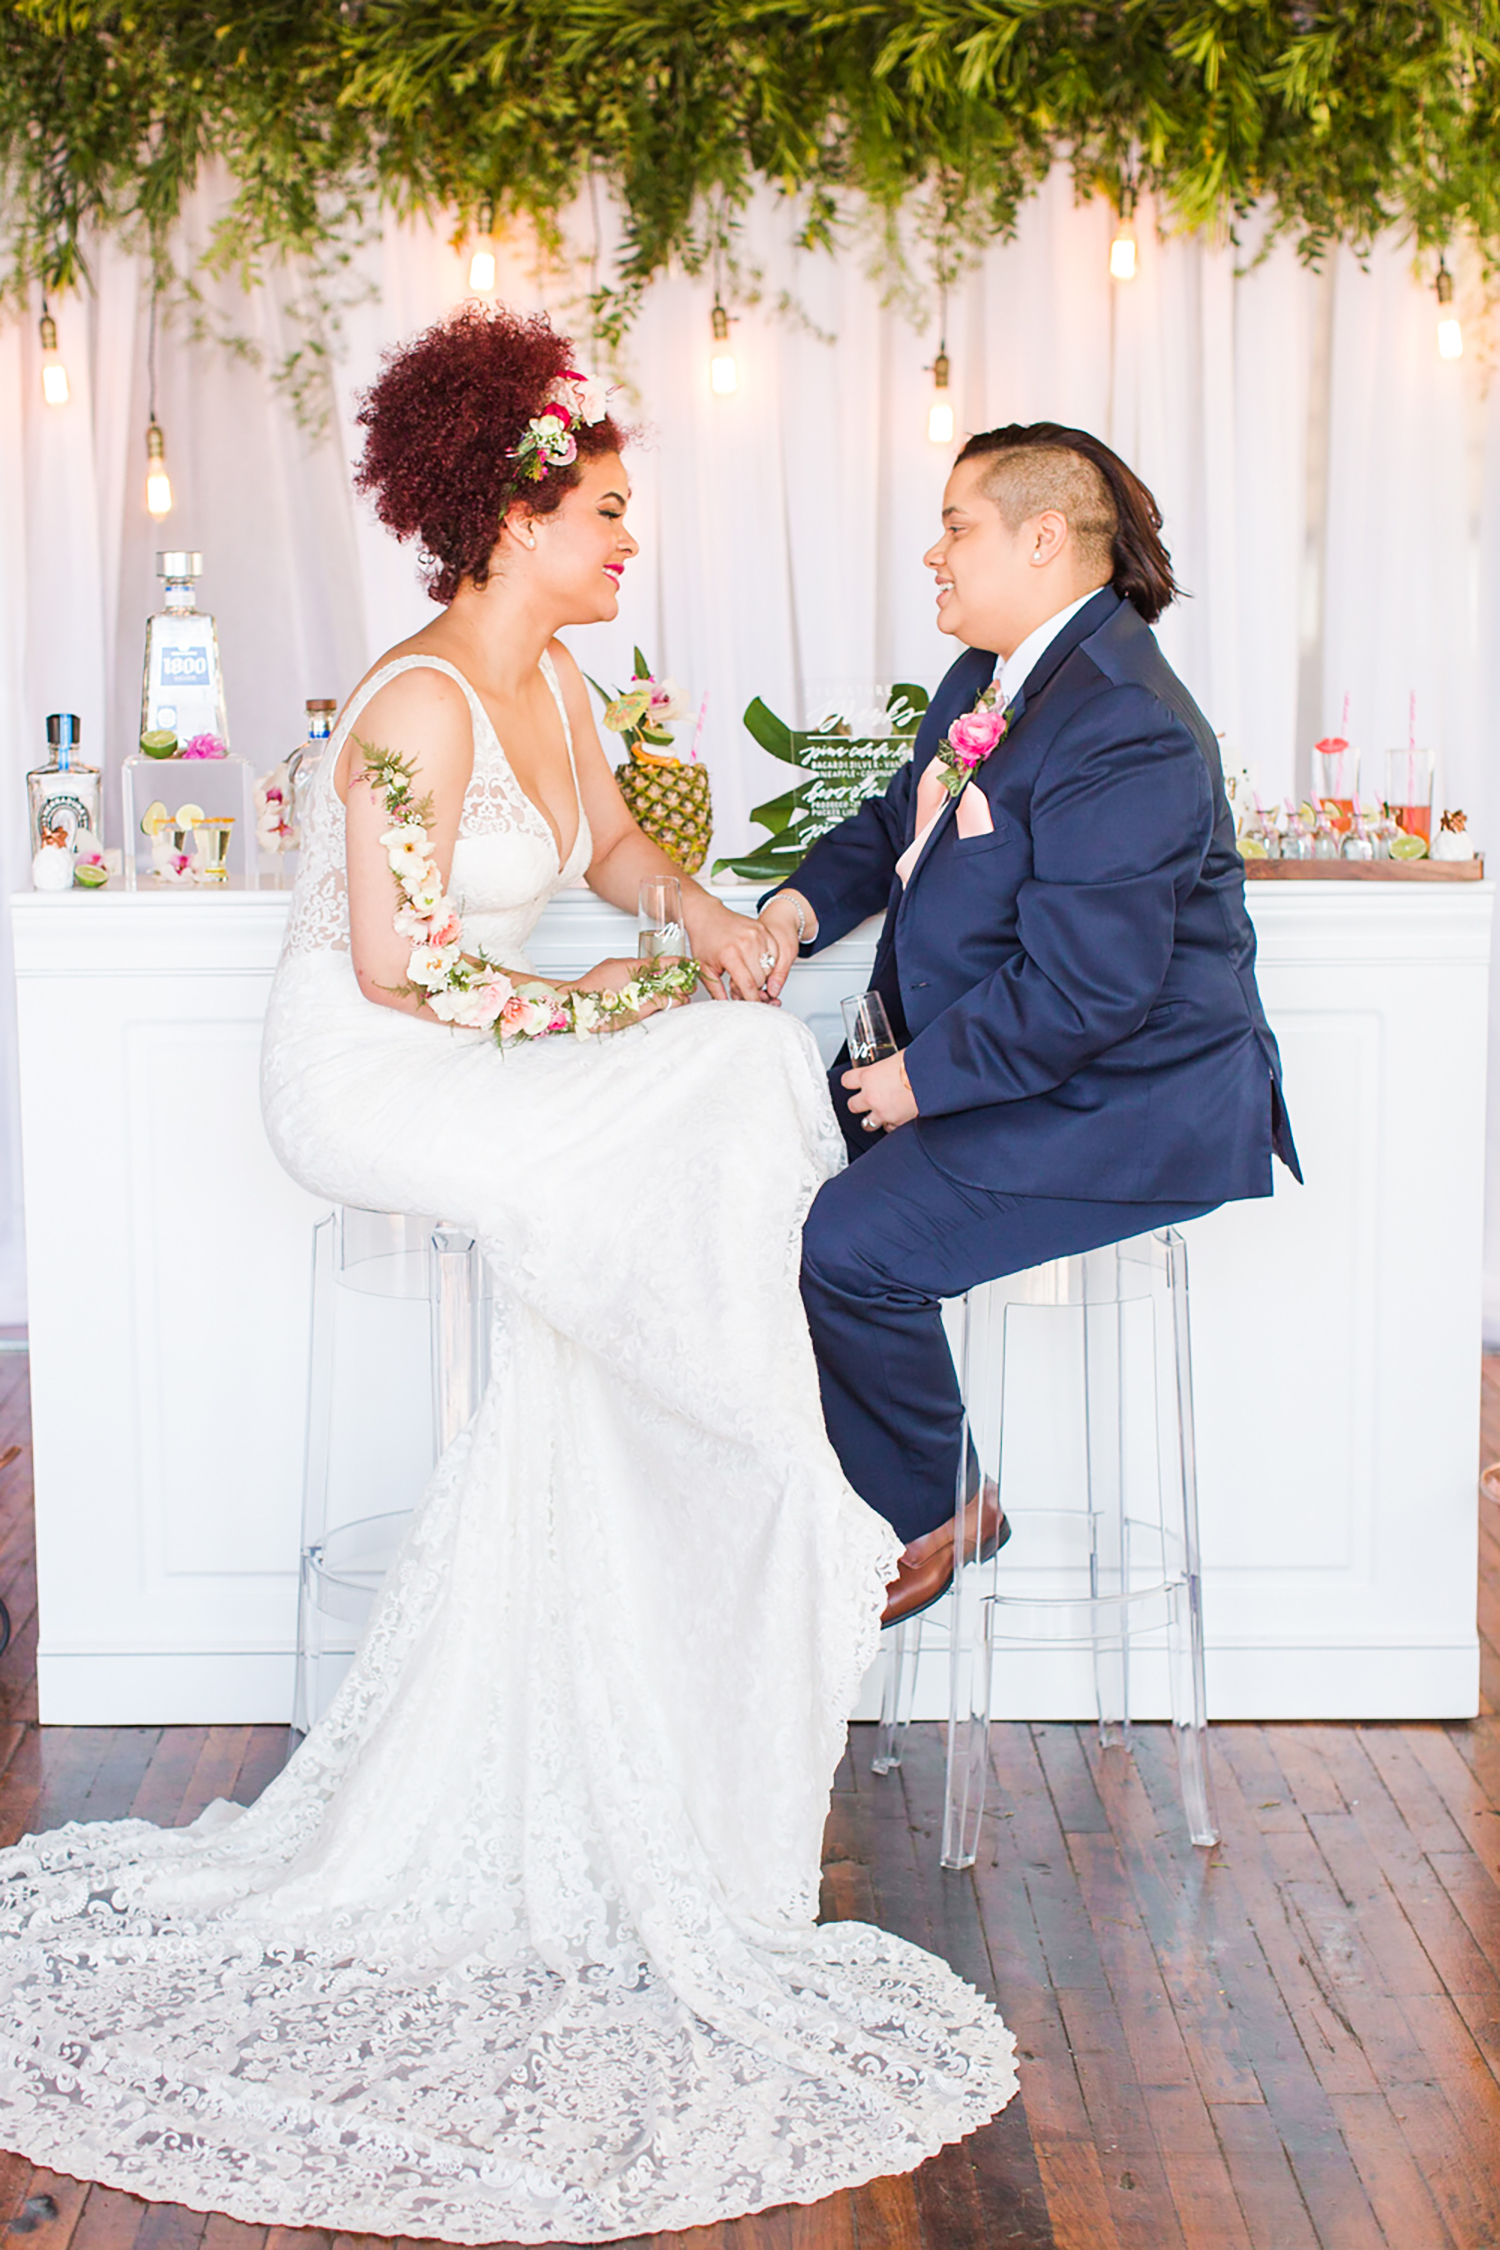 tropical-wedding-inspiration-ct-wedding-planner-19.jpg